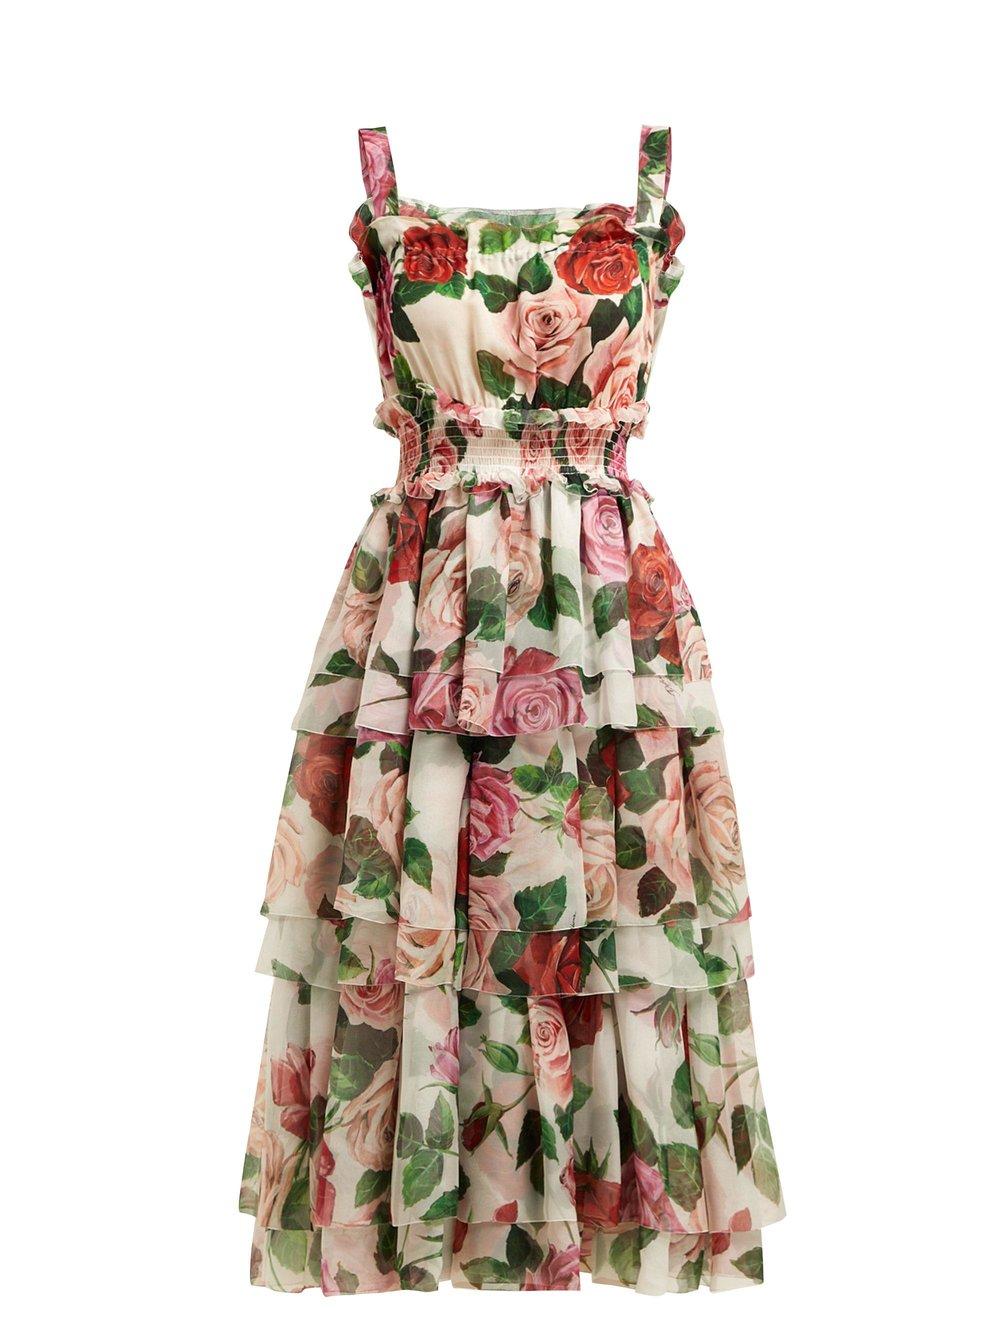 2. Dolce & Gabbana Rose-Print Tiered Silk-Chiffon Midi Dress $4,015 from www.matchesfashion.com